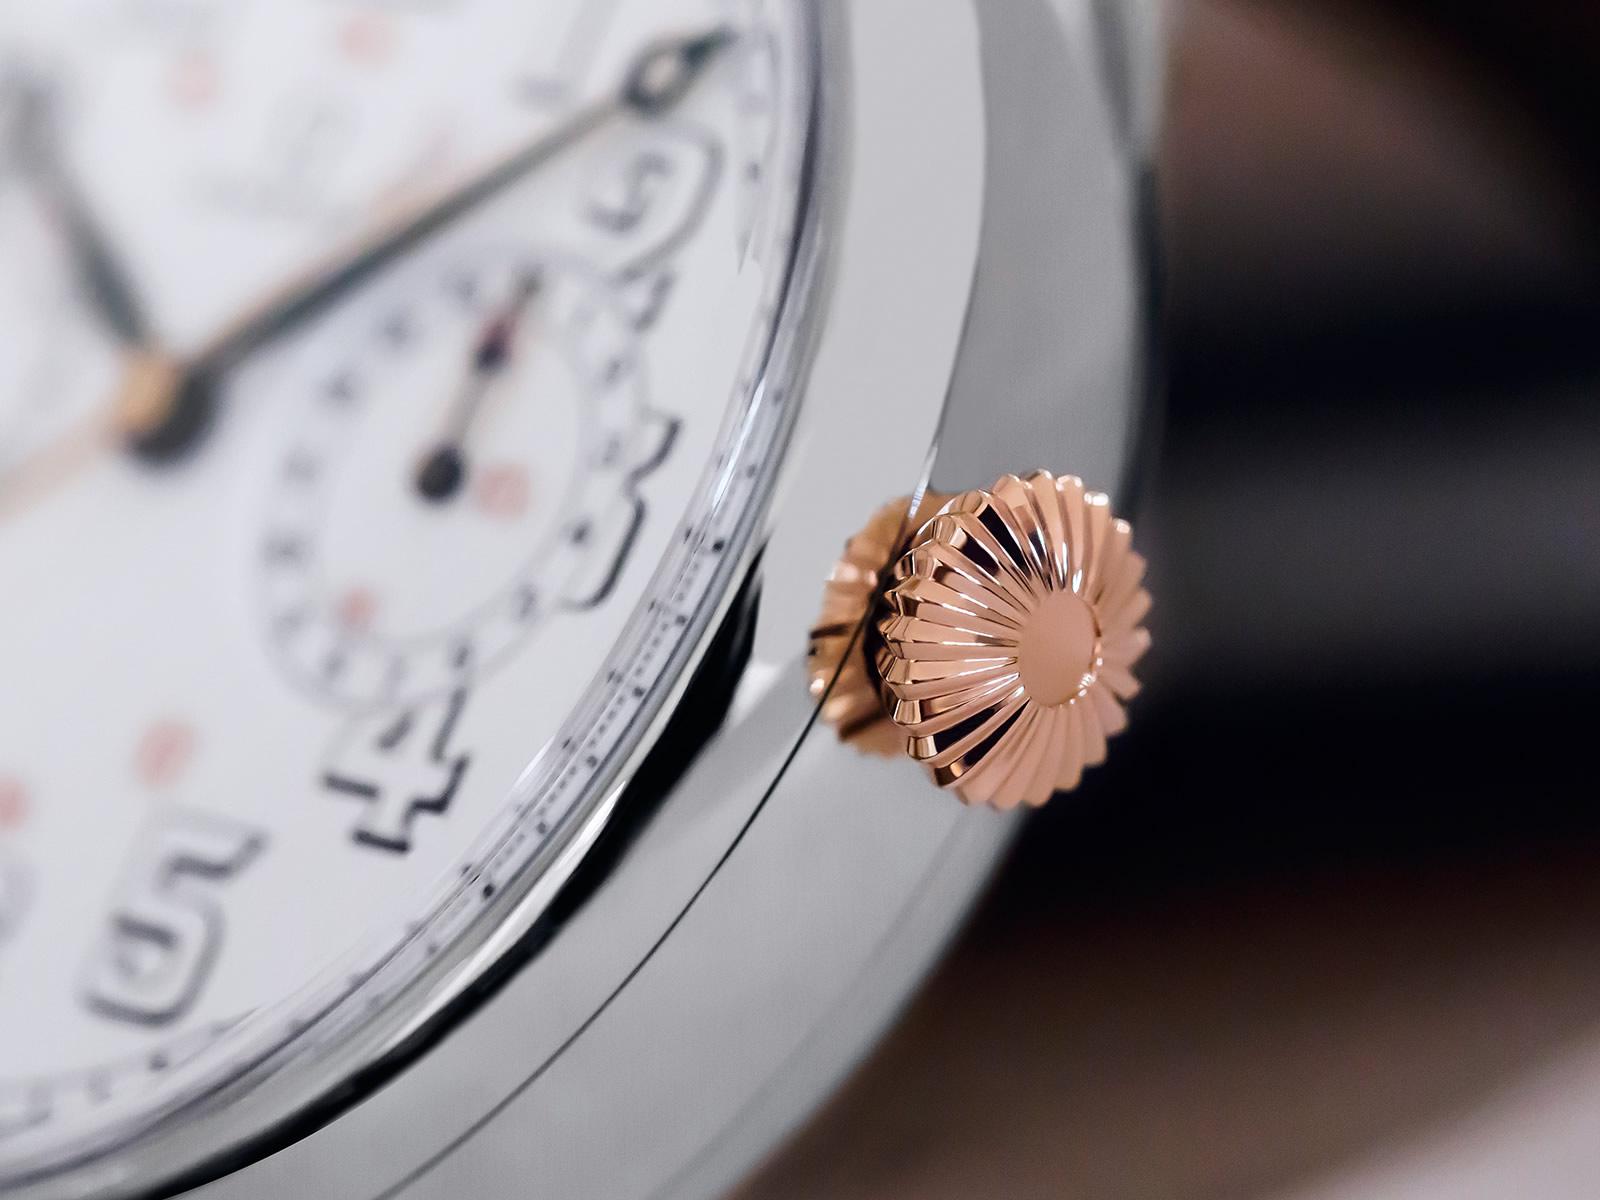 516-52-48-30-04-001-omega-18-chro-wrist-chronograph-limited-edition-4.jpg